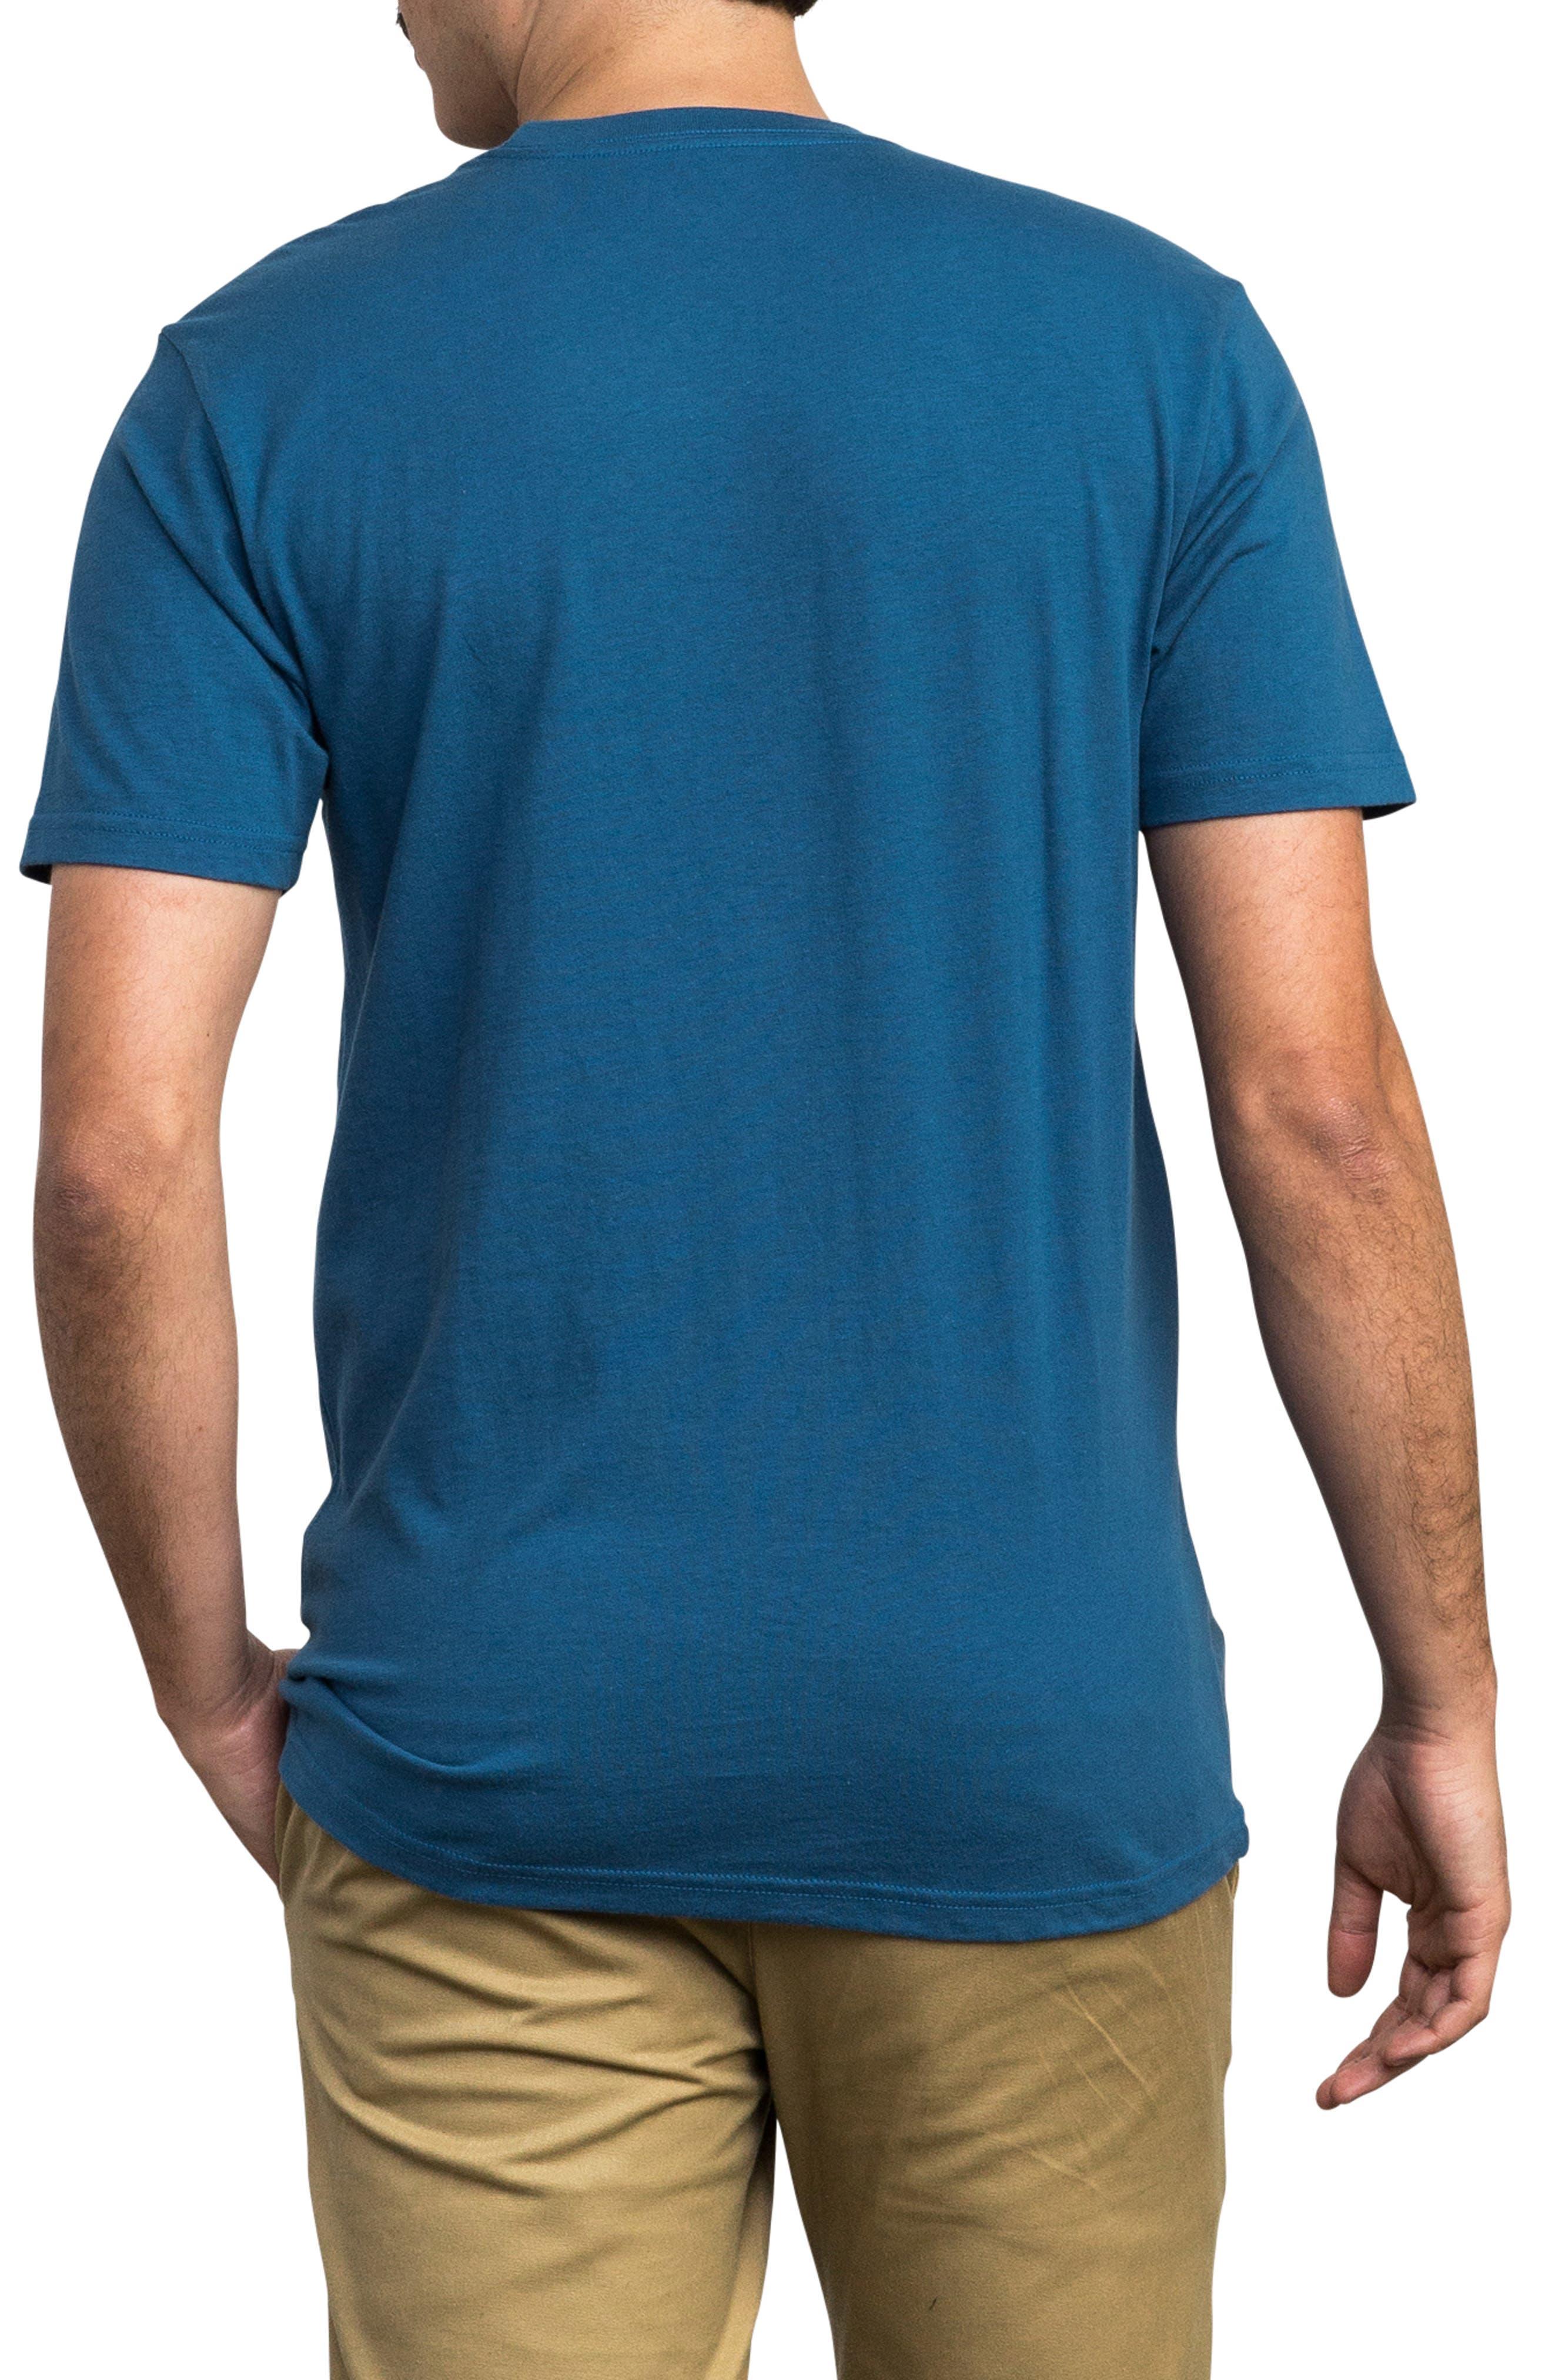 Copy Box Logo T-Shirt,                             Alternate thumbnail 2, color,                             BRIGHT BLUE